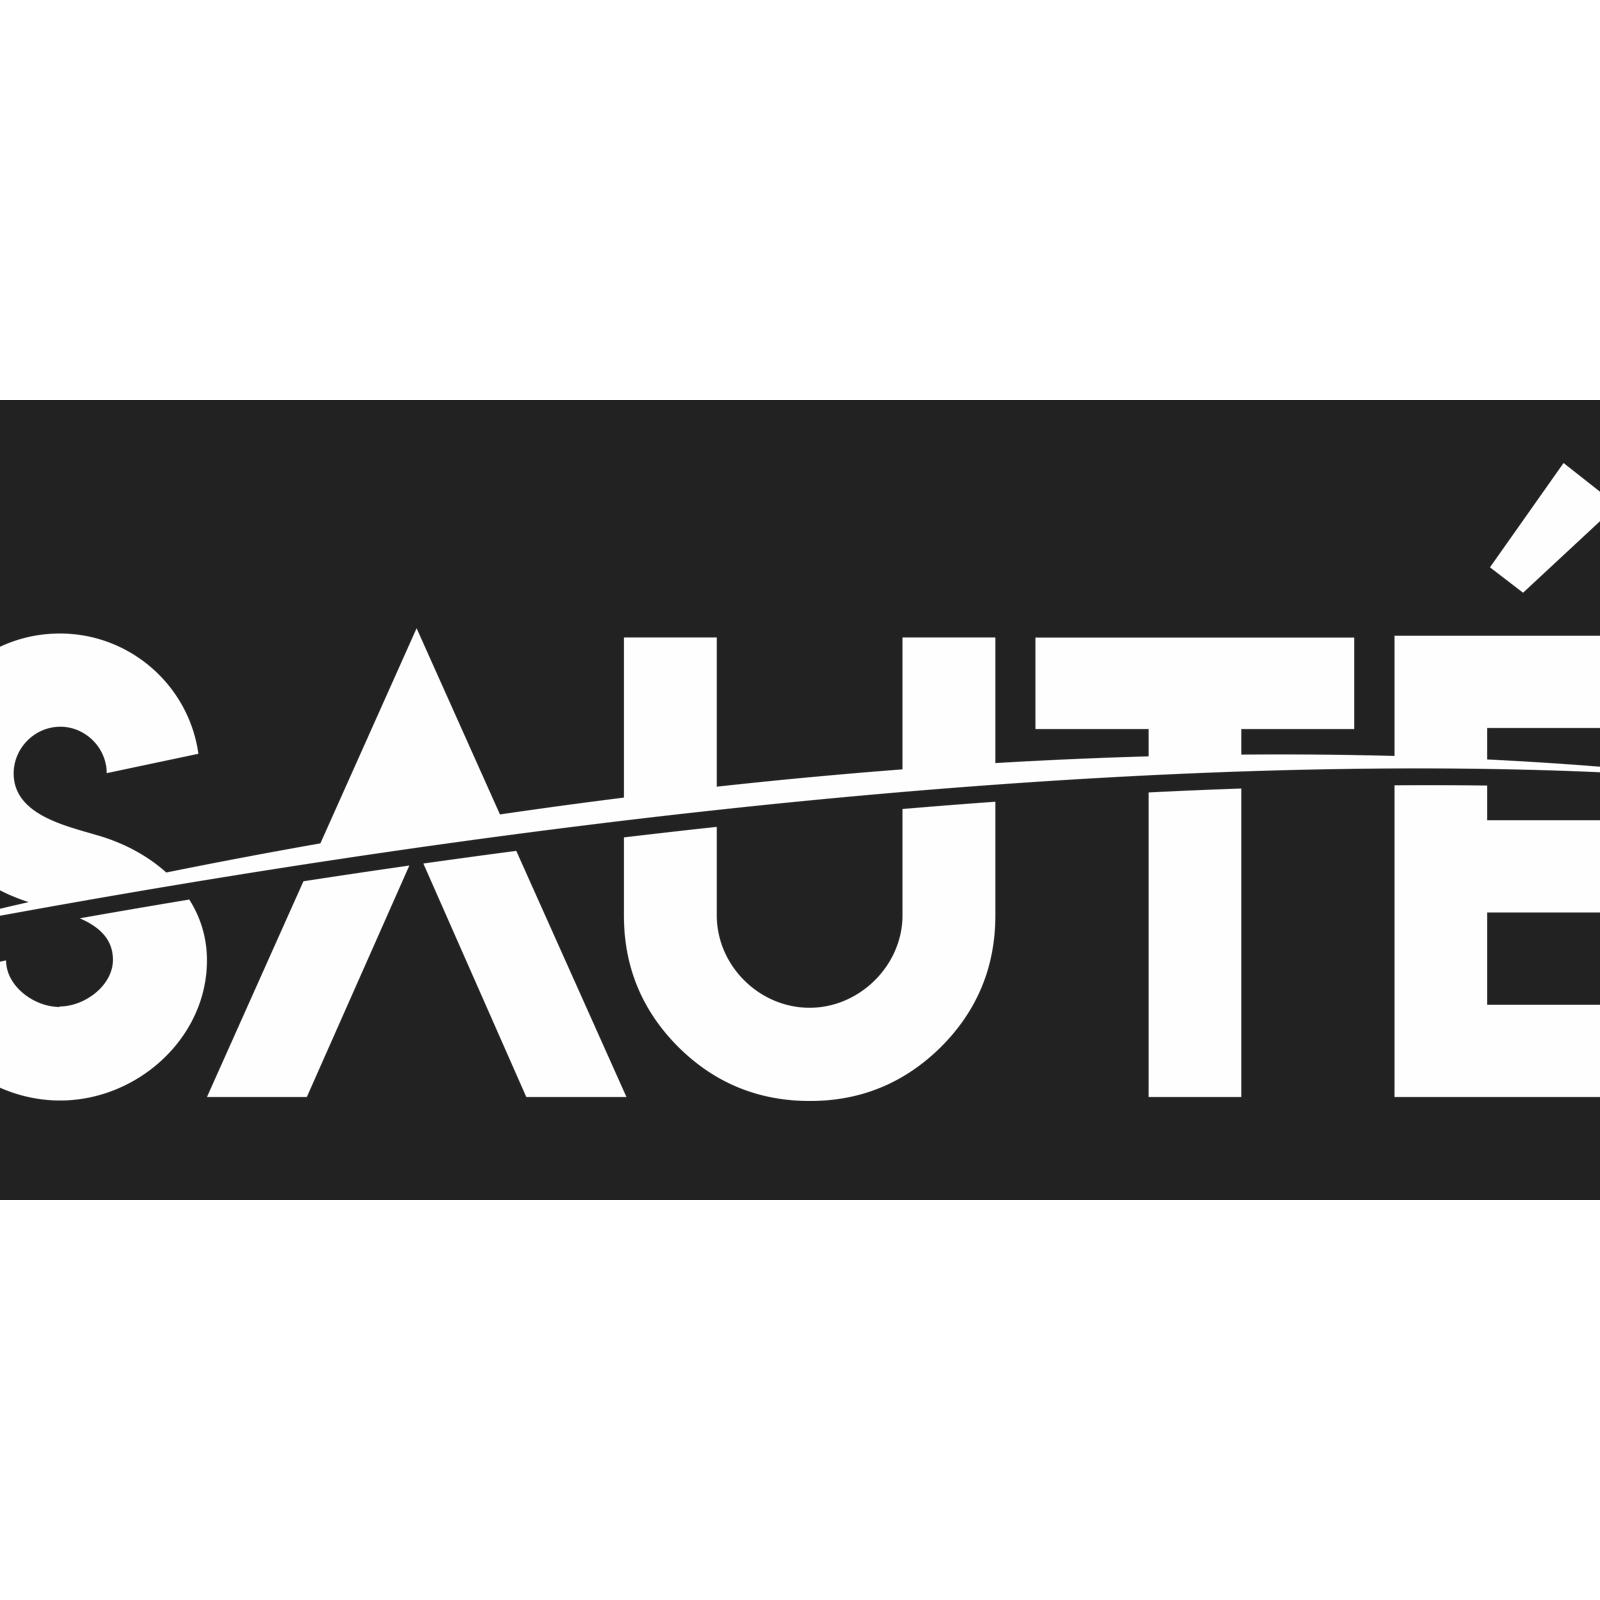 Saute Restaurant logo